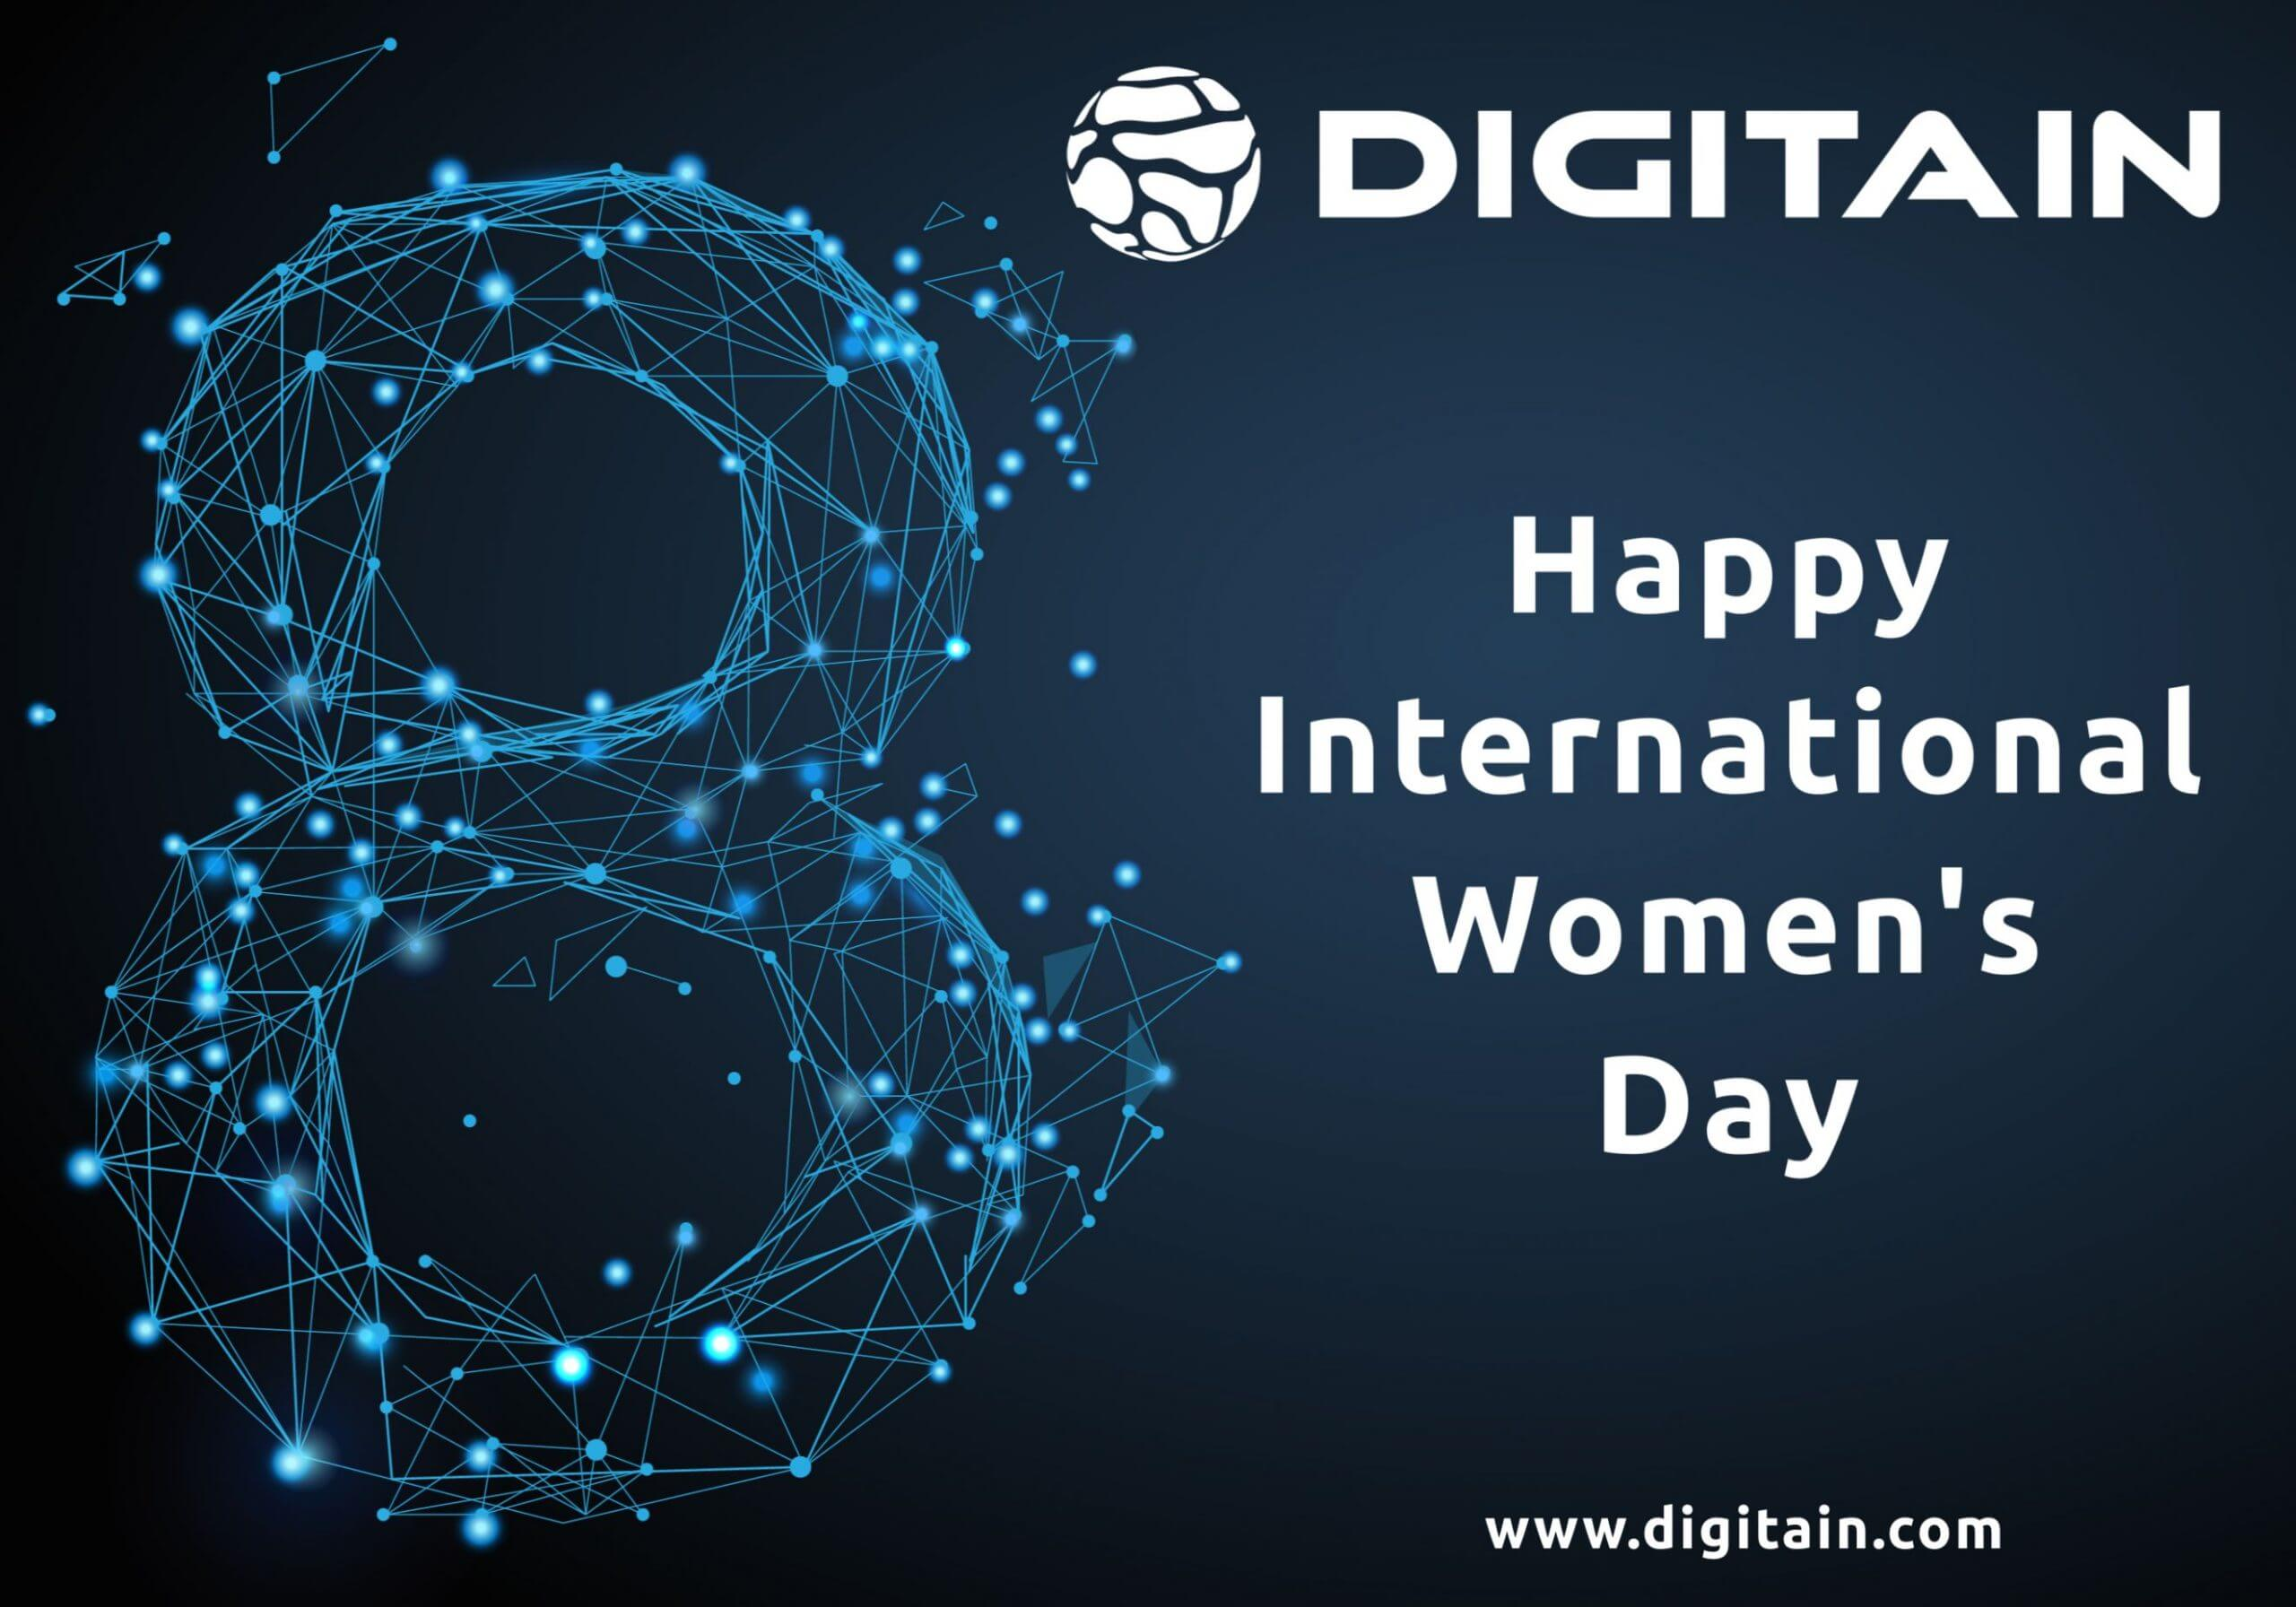 Digitain-wishings-on-the-International-Womens-Day